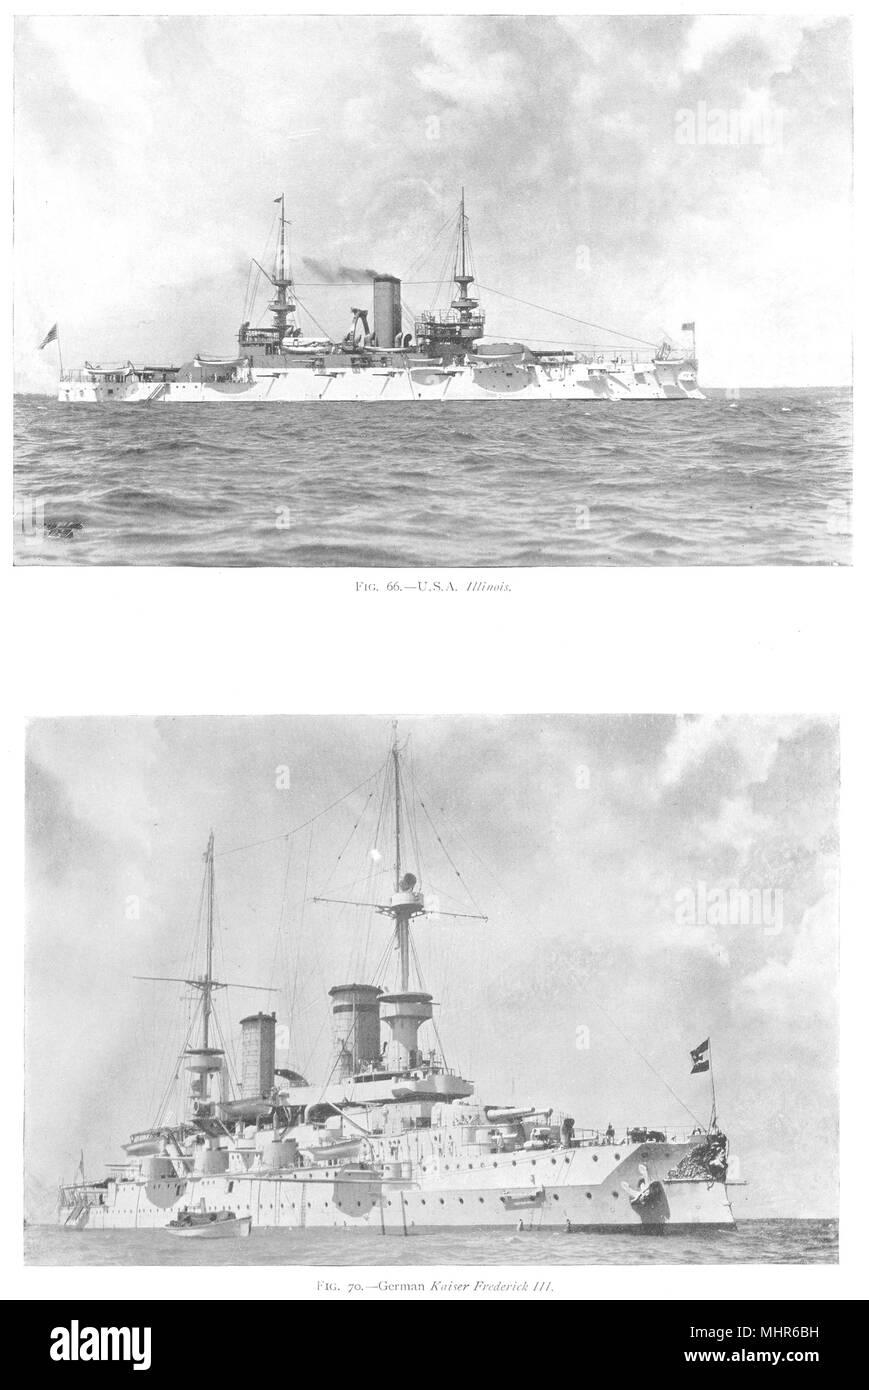 SHIPS. U S A Illinois; German Kaiser Frederick III 1910 old antique print - Stock Image